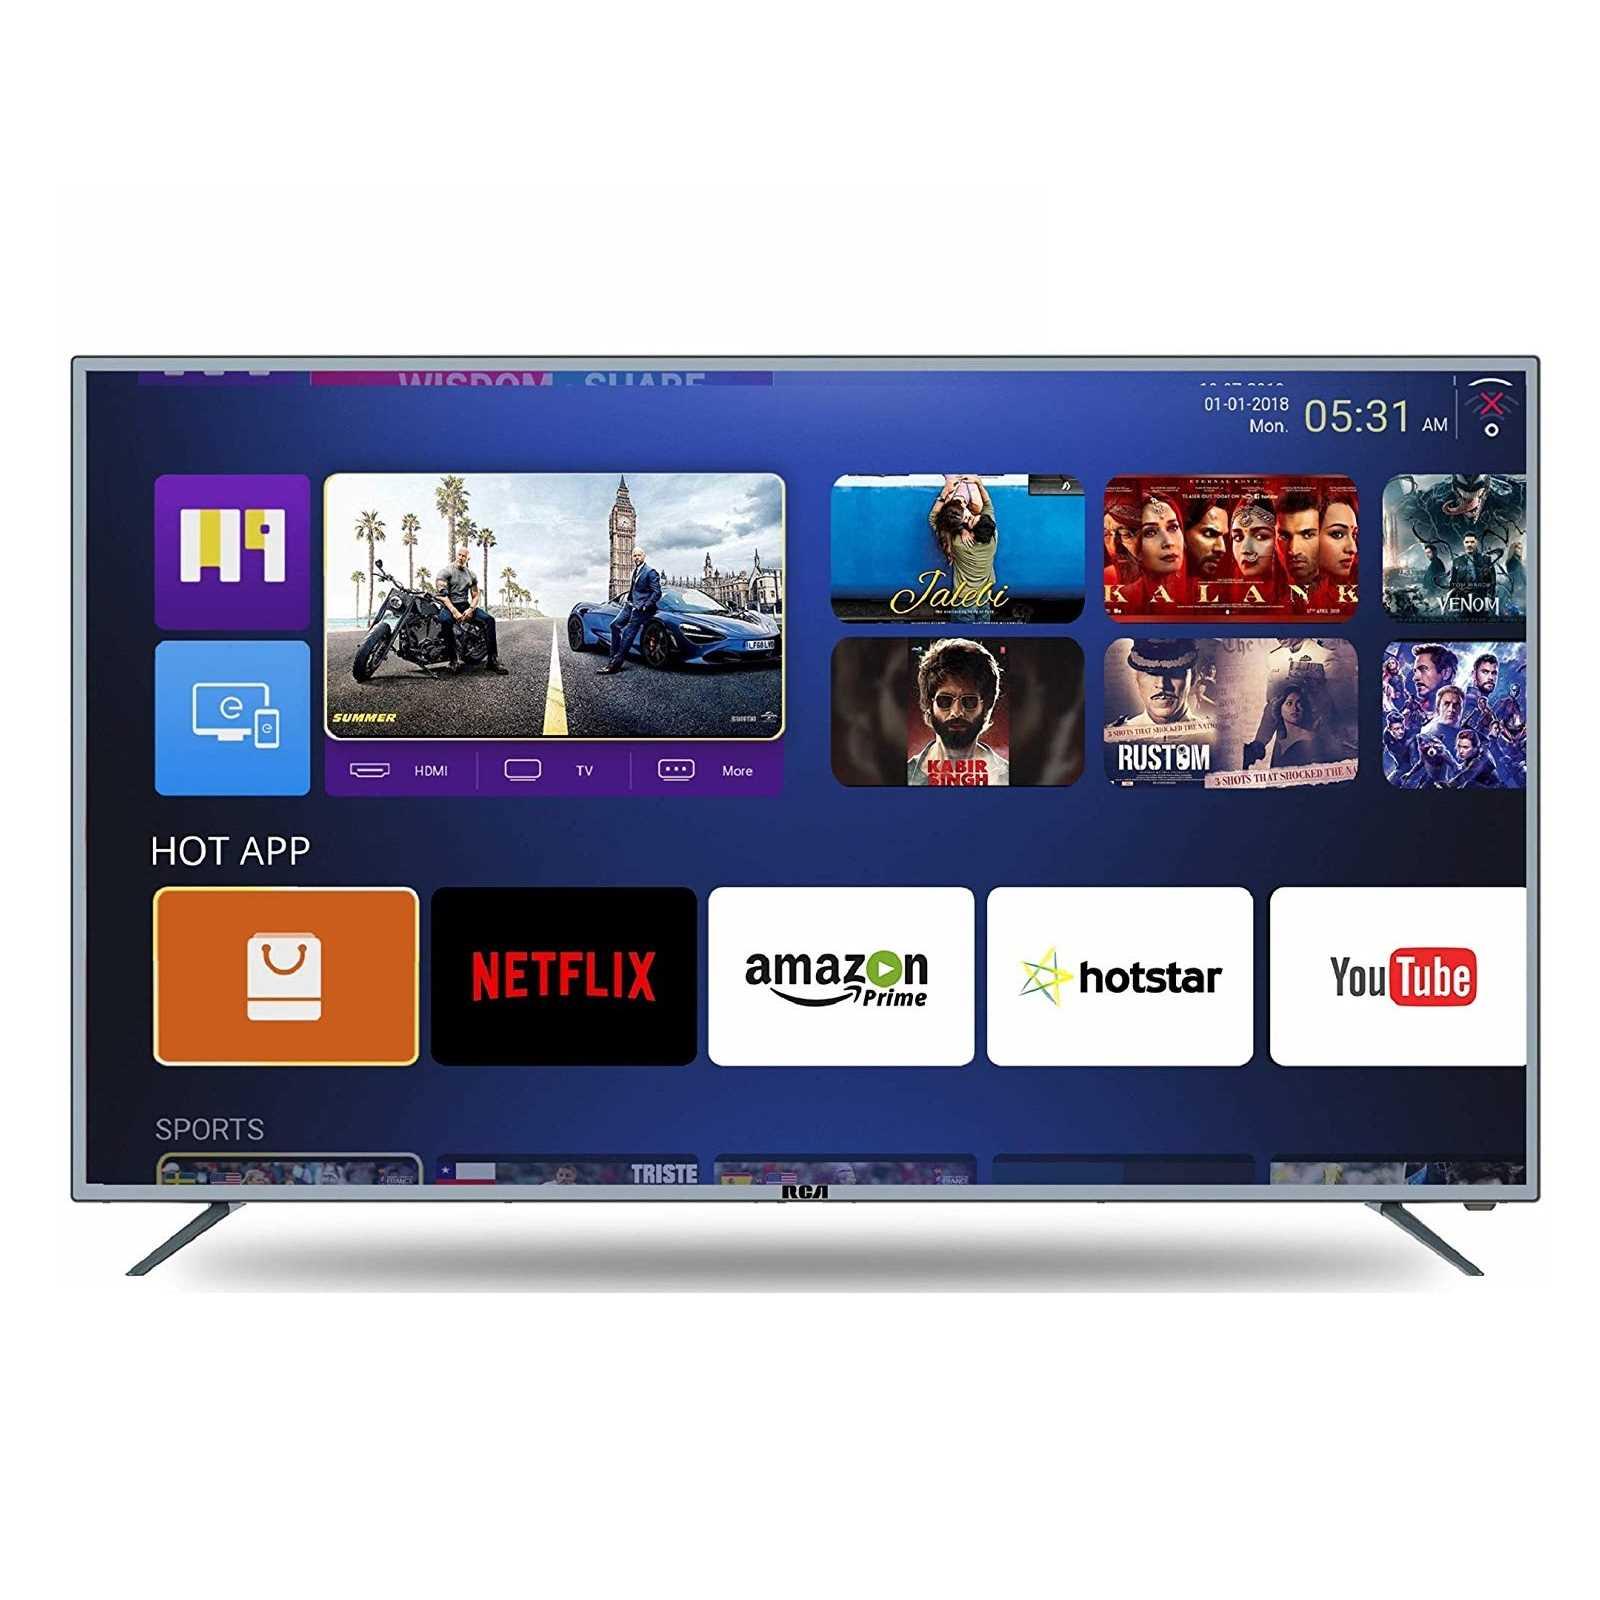 RCA 55WR1904U 55 Inch 4K Ultra HD Smart LED Television